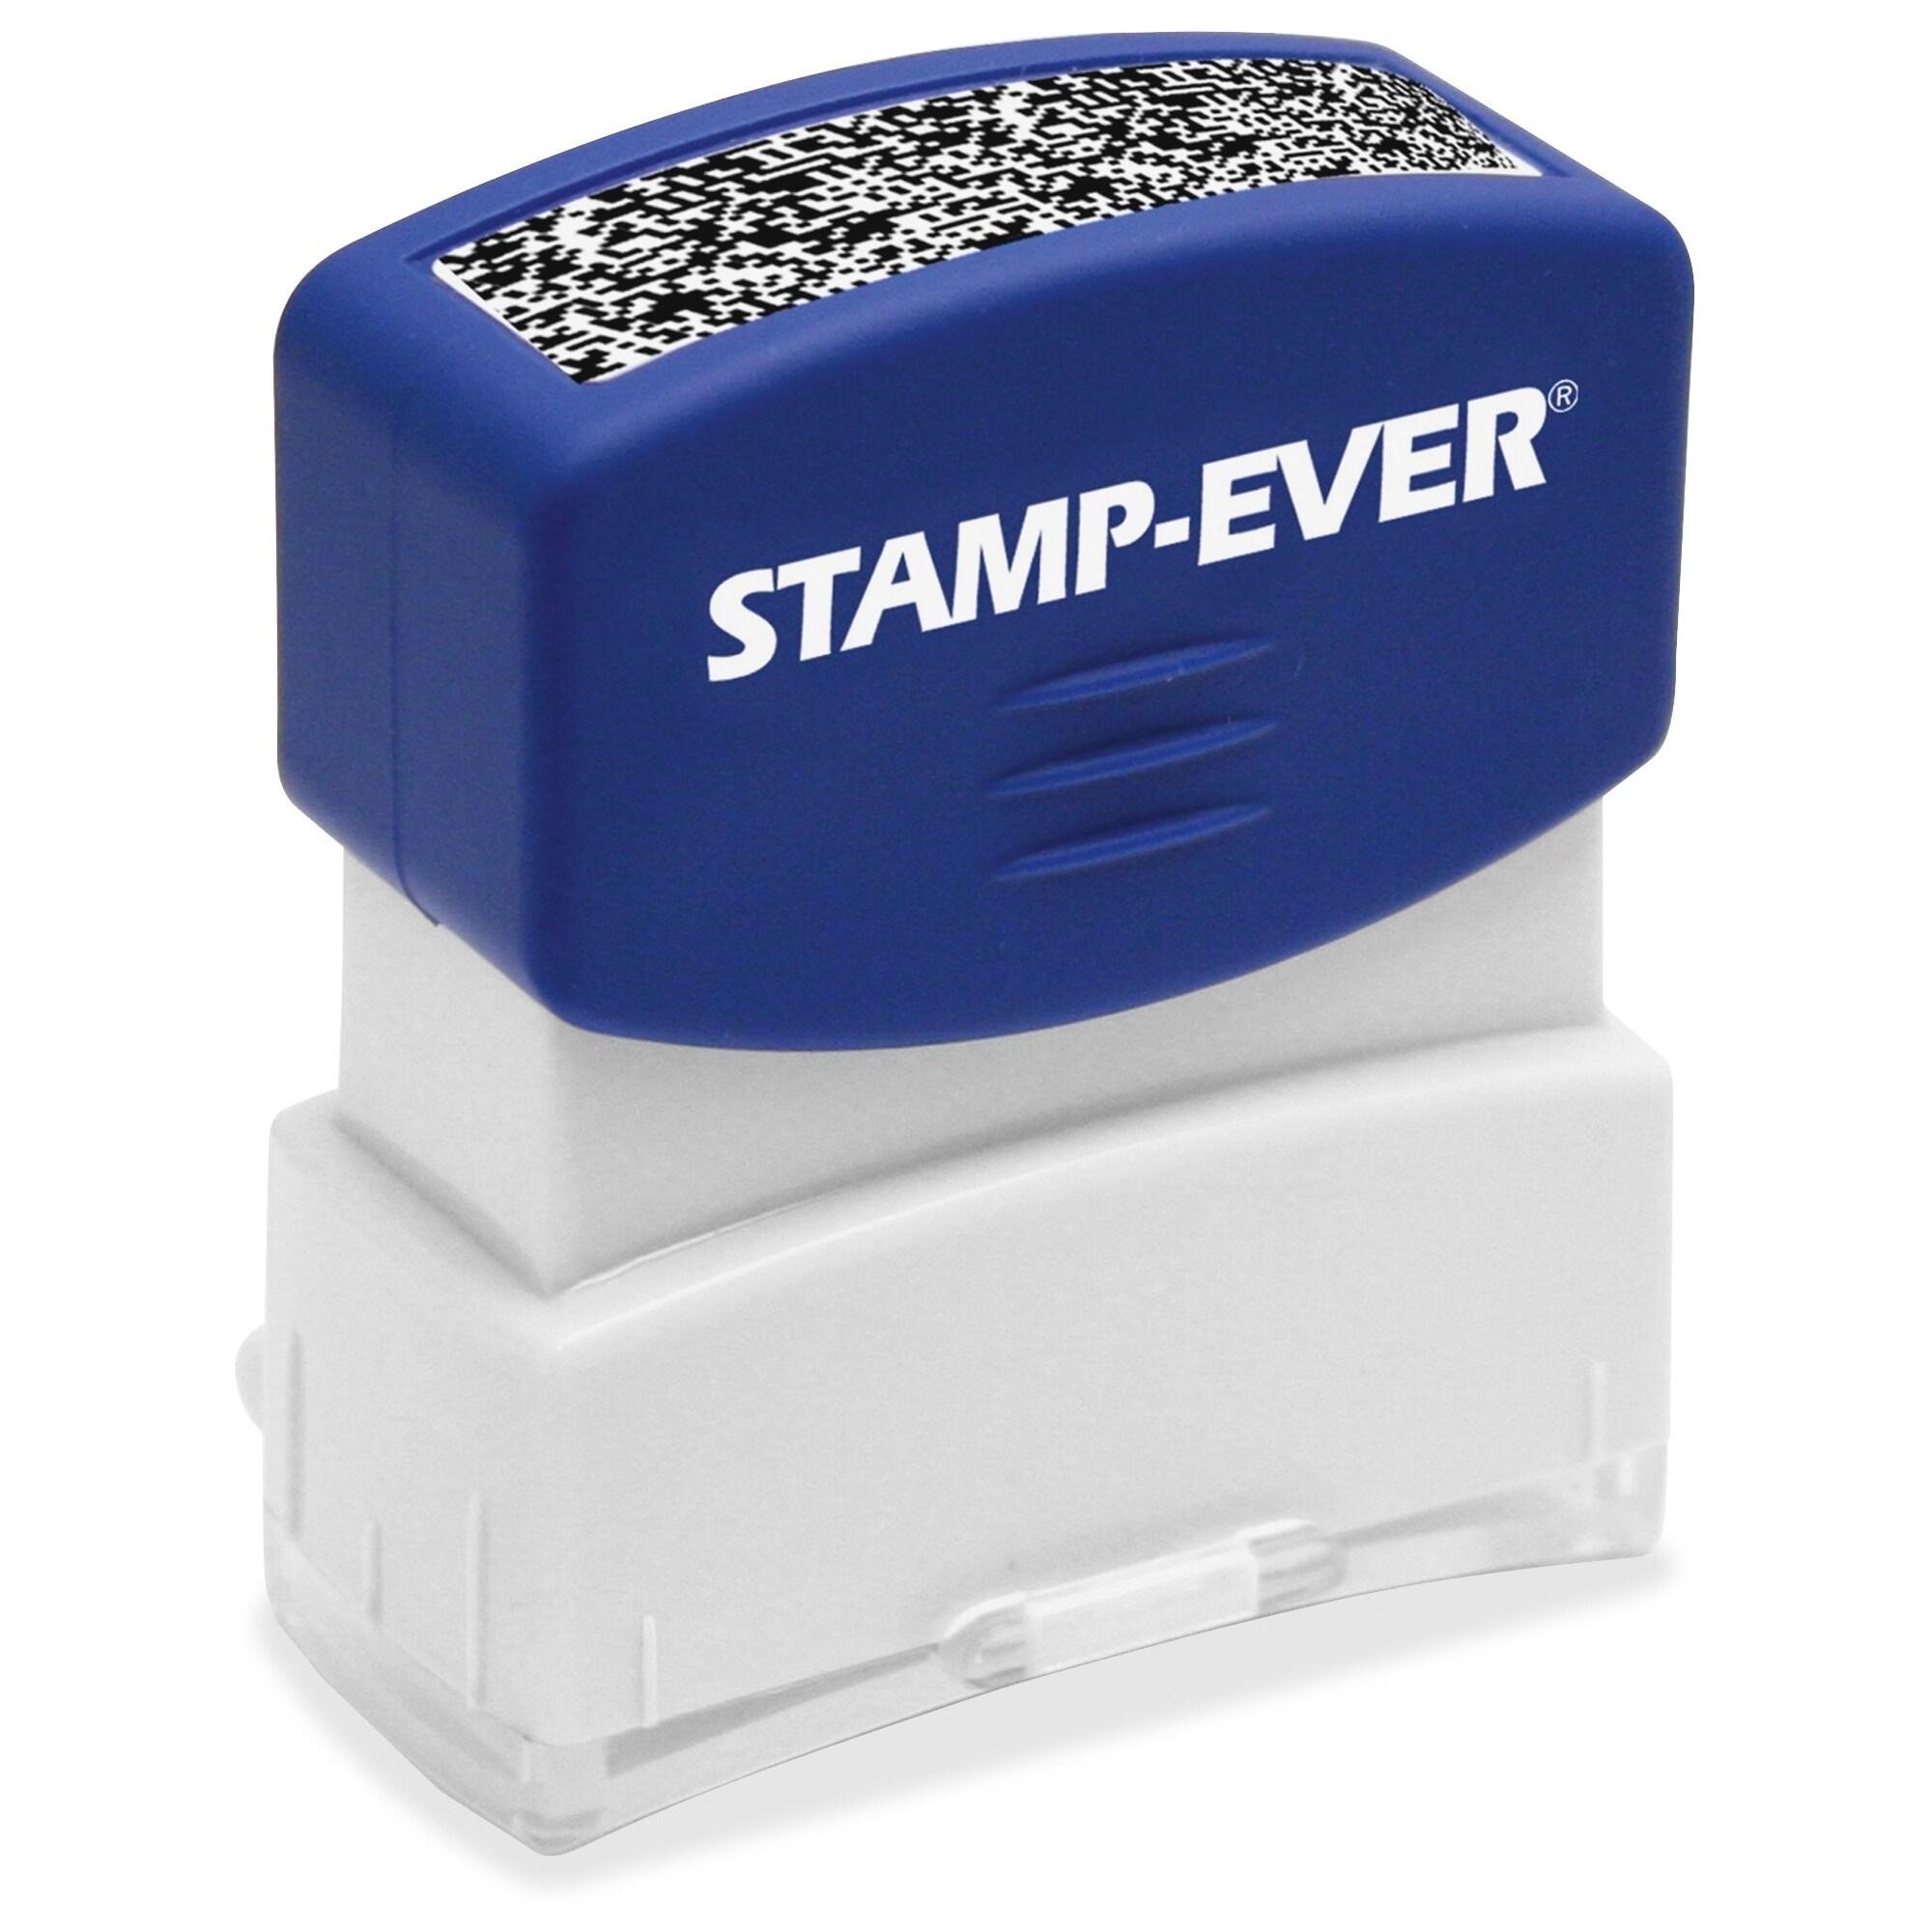 U.S. STAMP & SIGN Pre-inked Security Block Stamp - Blue (...